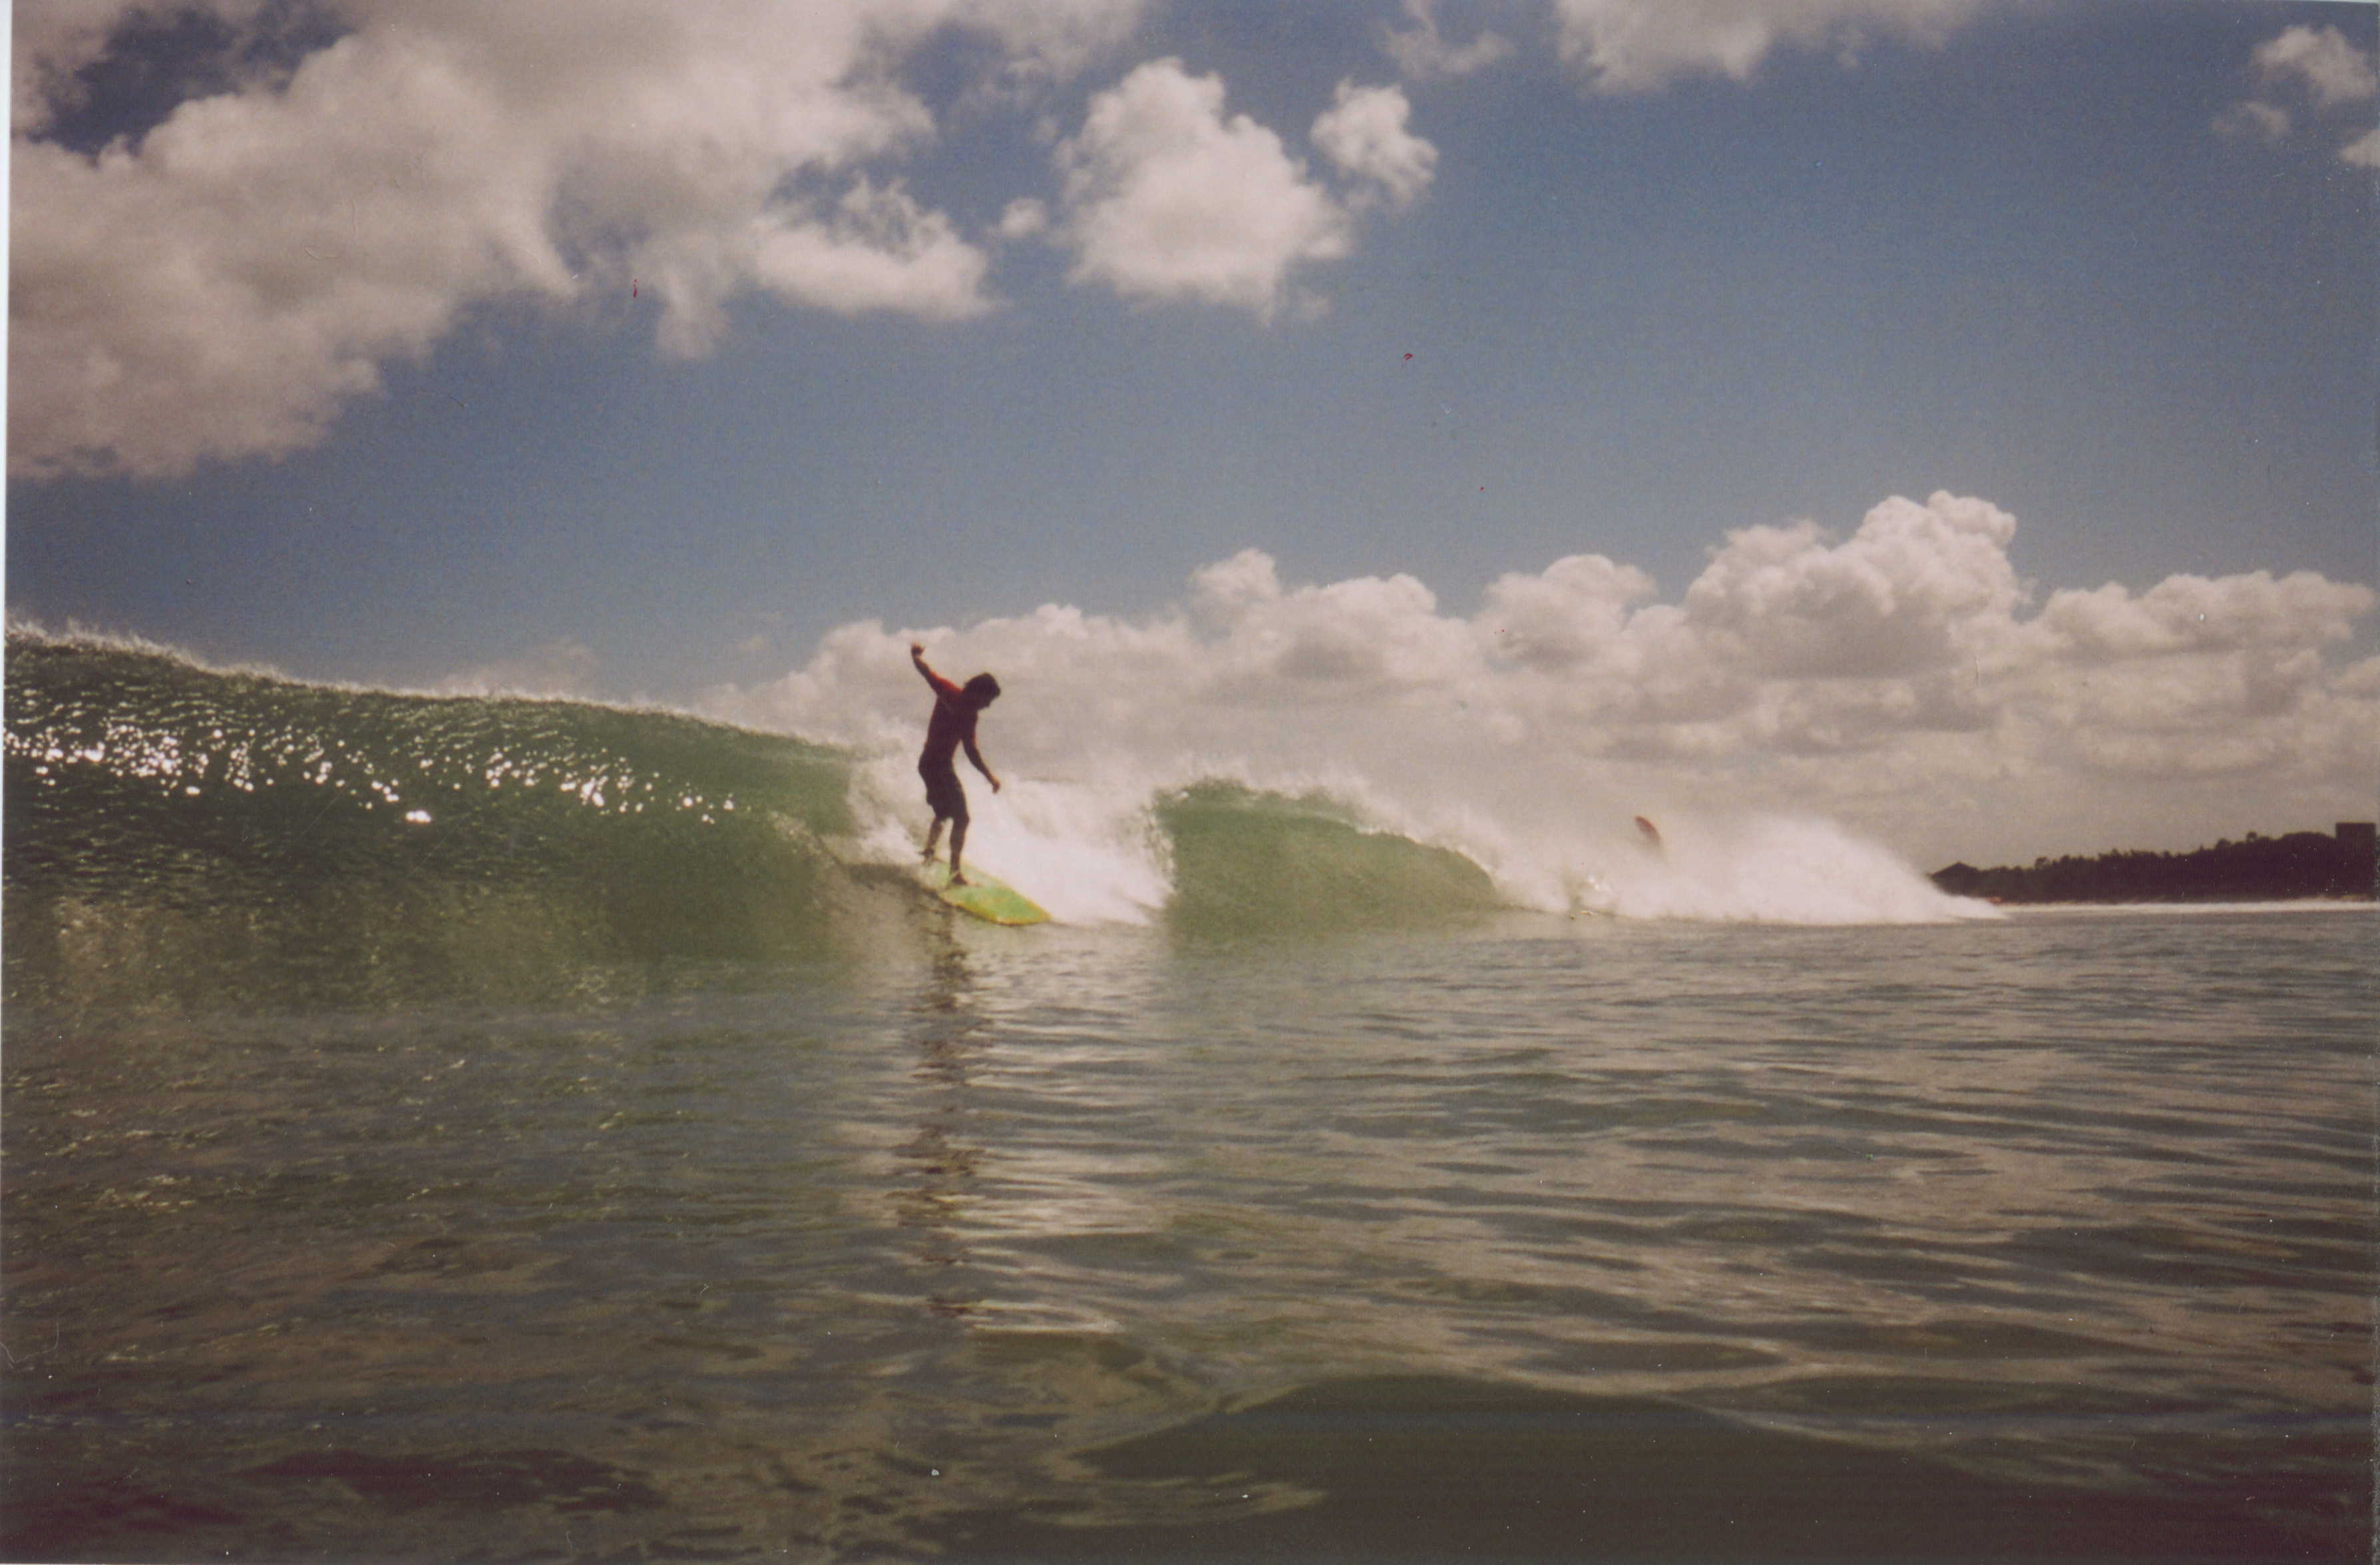 Iurgi surf